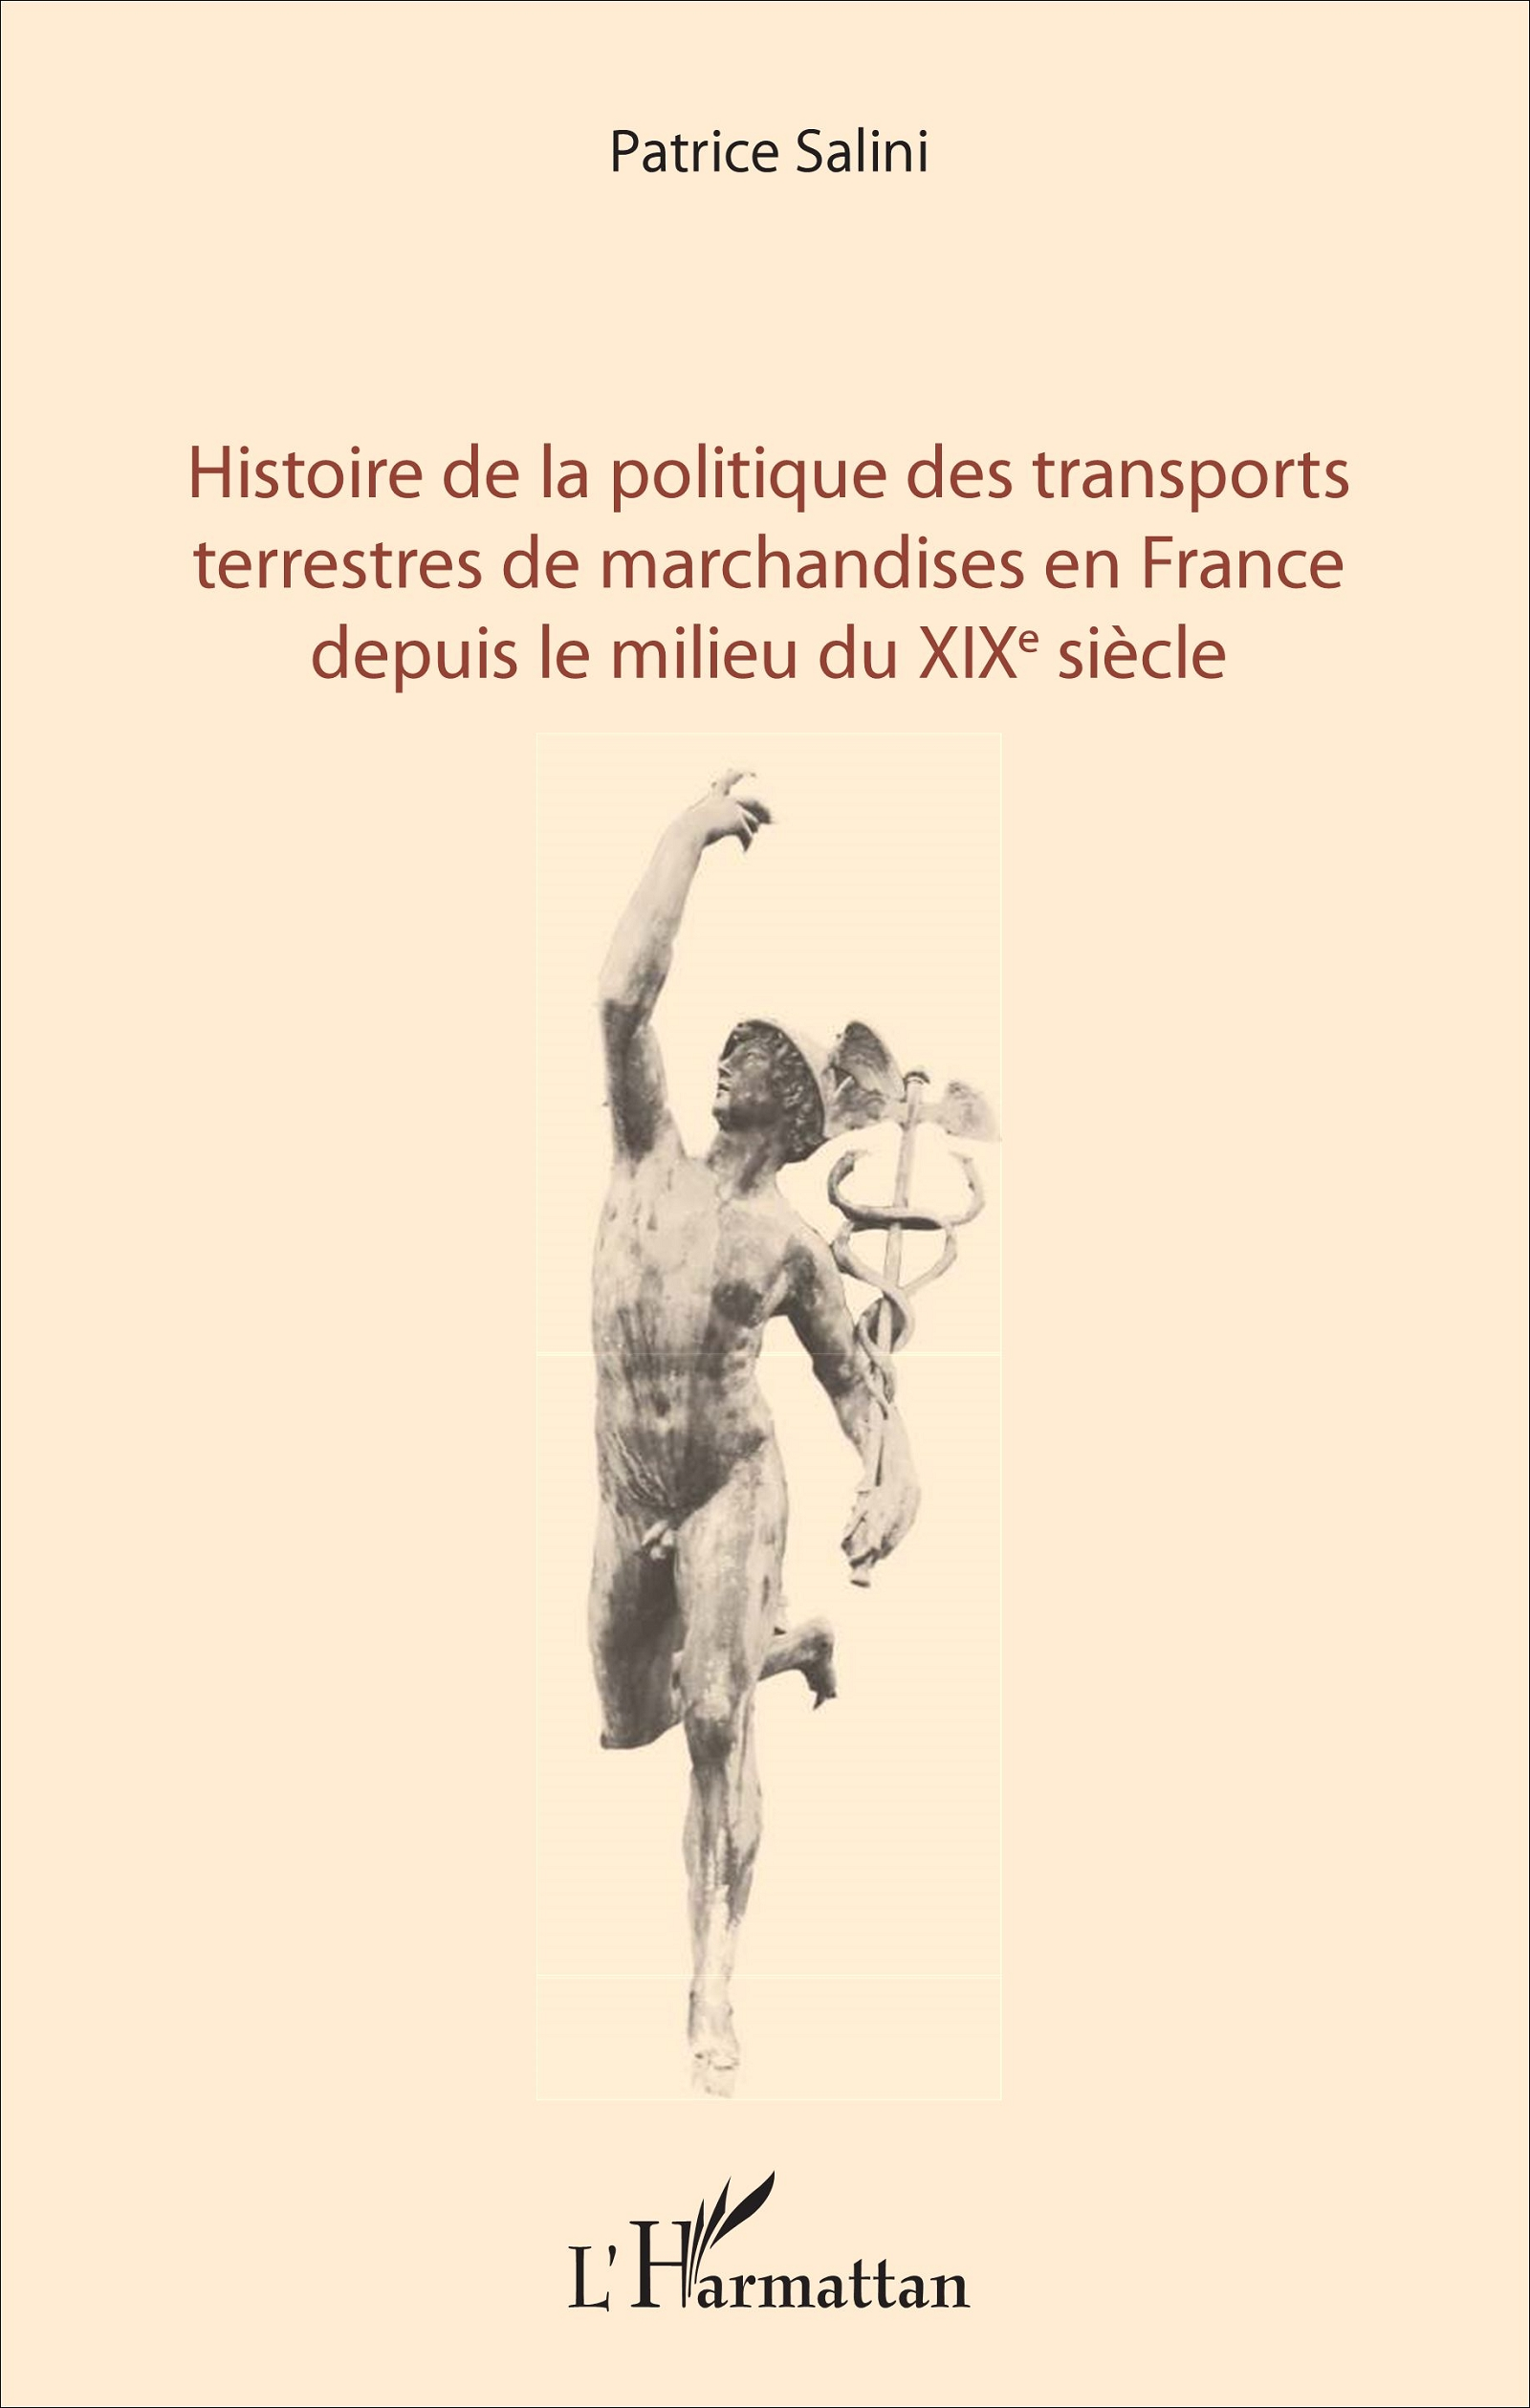 histoire france bd pdf vk.com